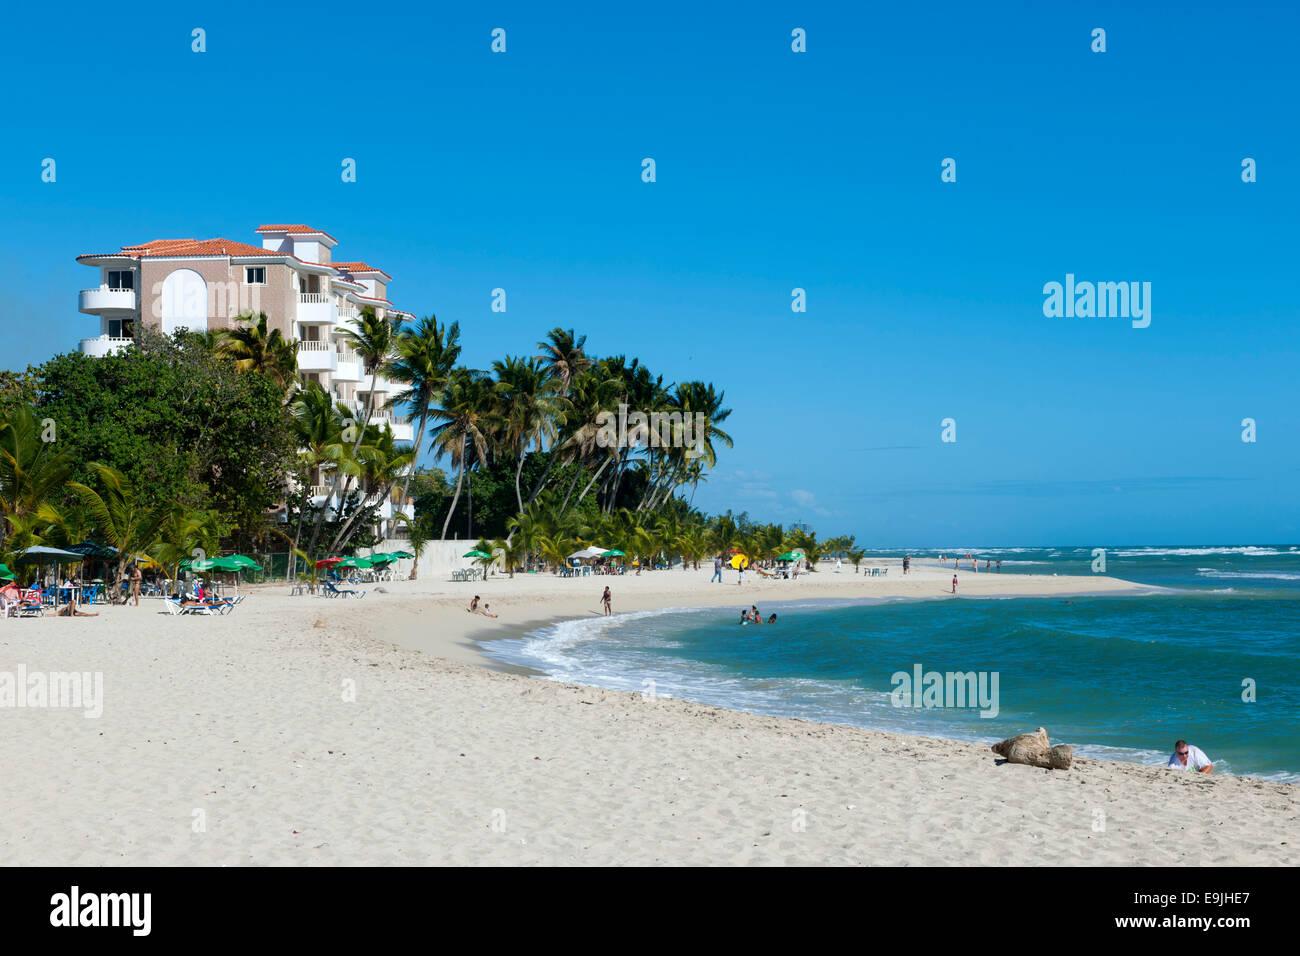 Dominikanische Republik, osten, juan dolio, guayacanes-strand Banque D'Images